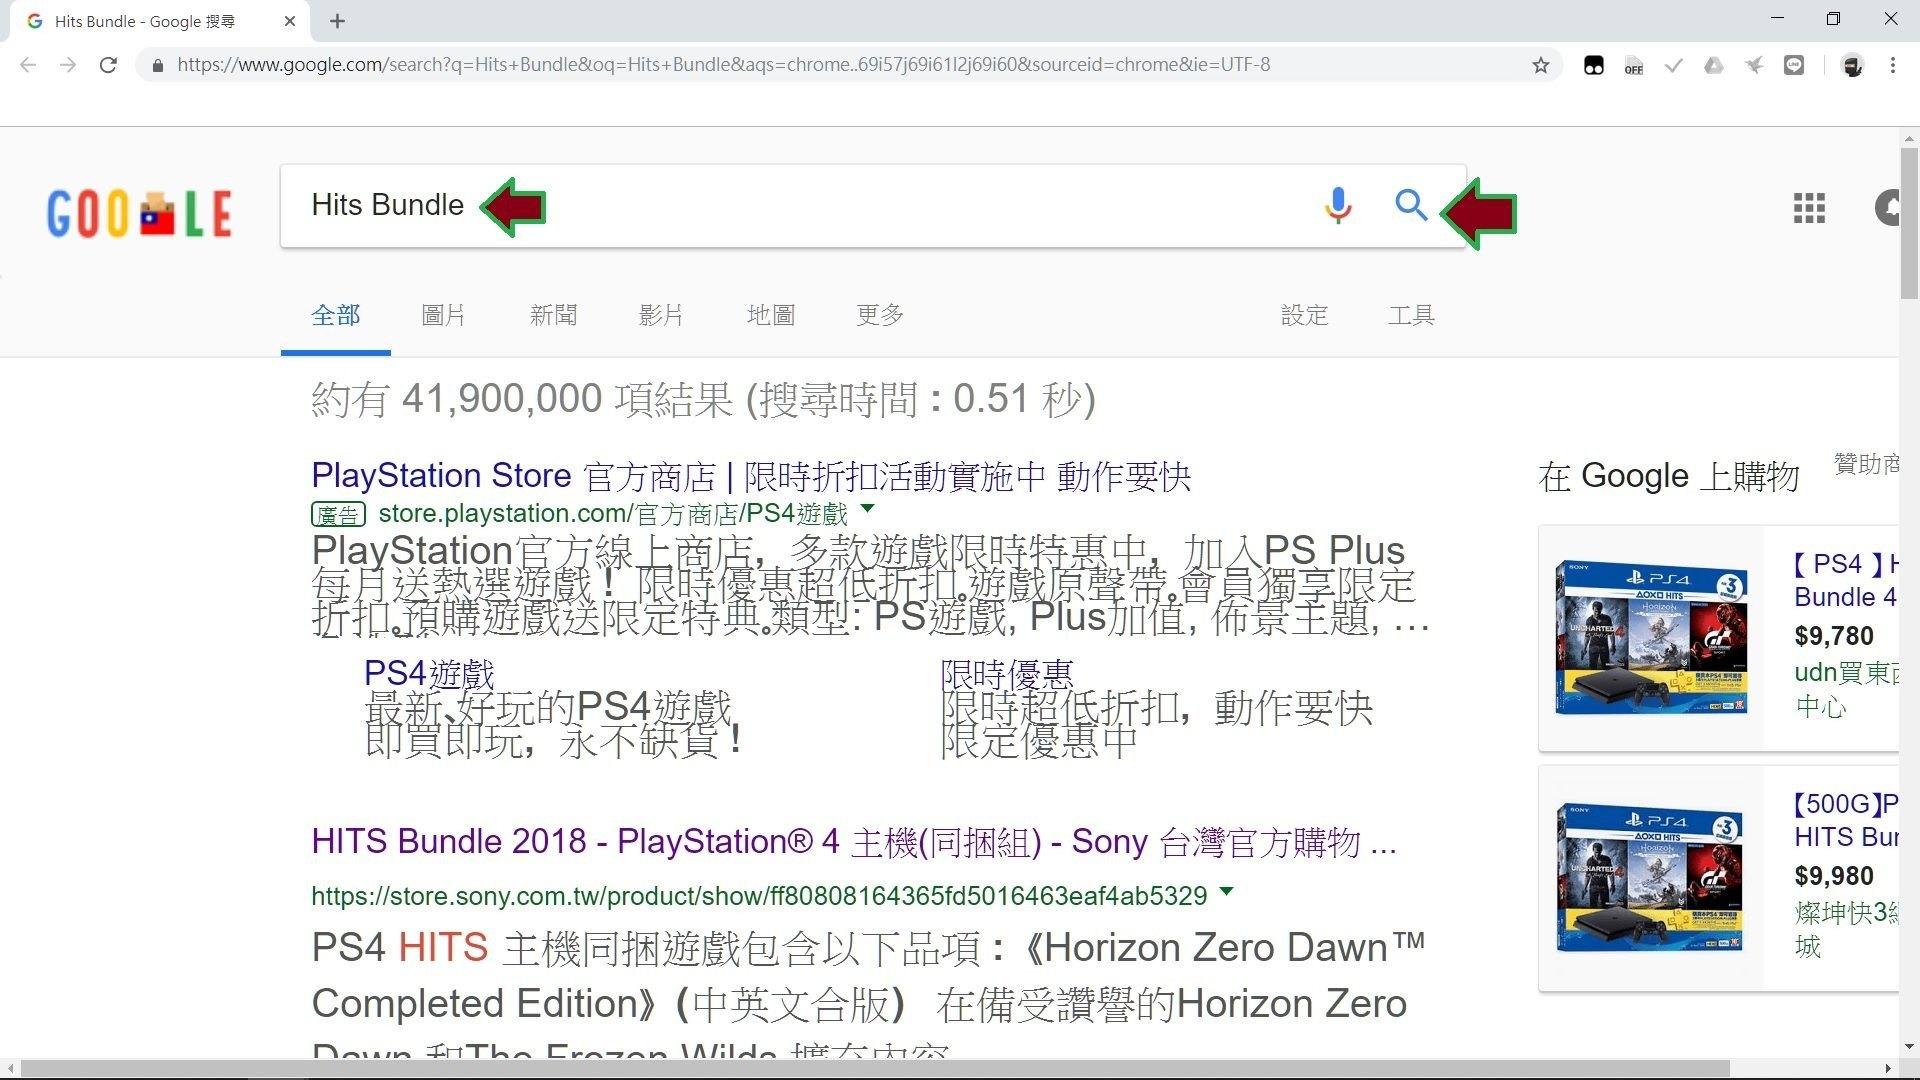 【問題】請問Hits Bundle @PS4 / PlayStation4 哈啦板 - 巴哈姆特